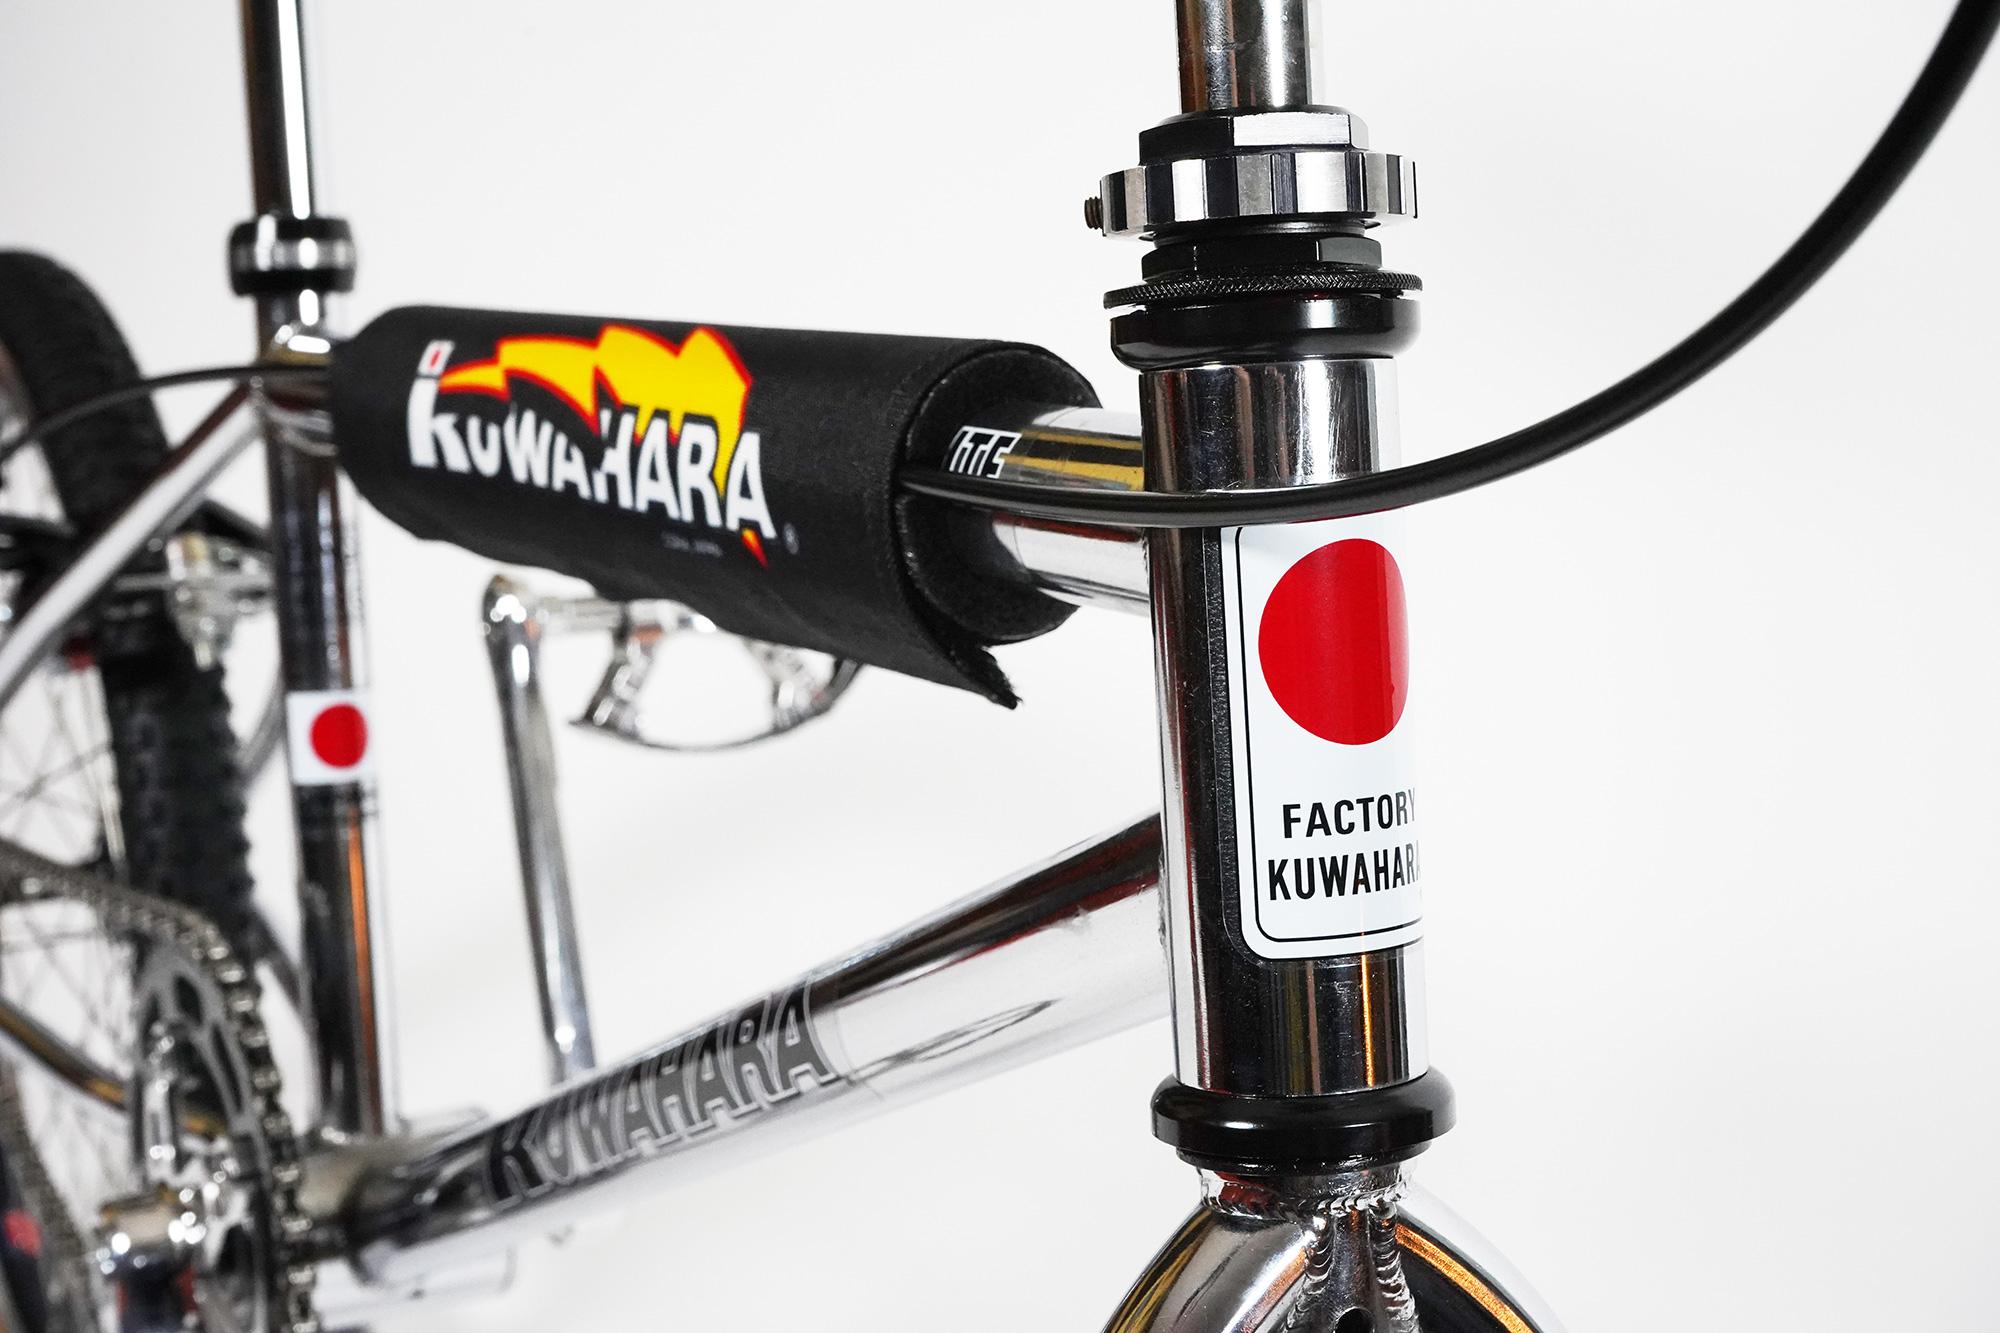 1983 Kuwahara Laserlite Factory